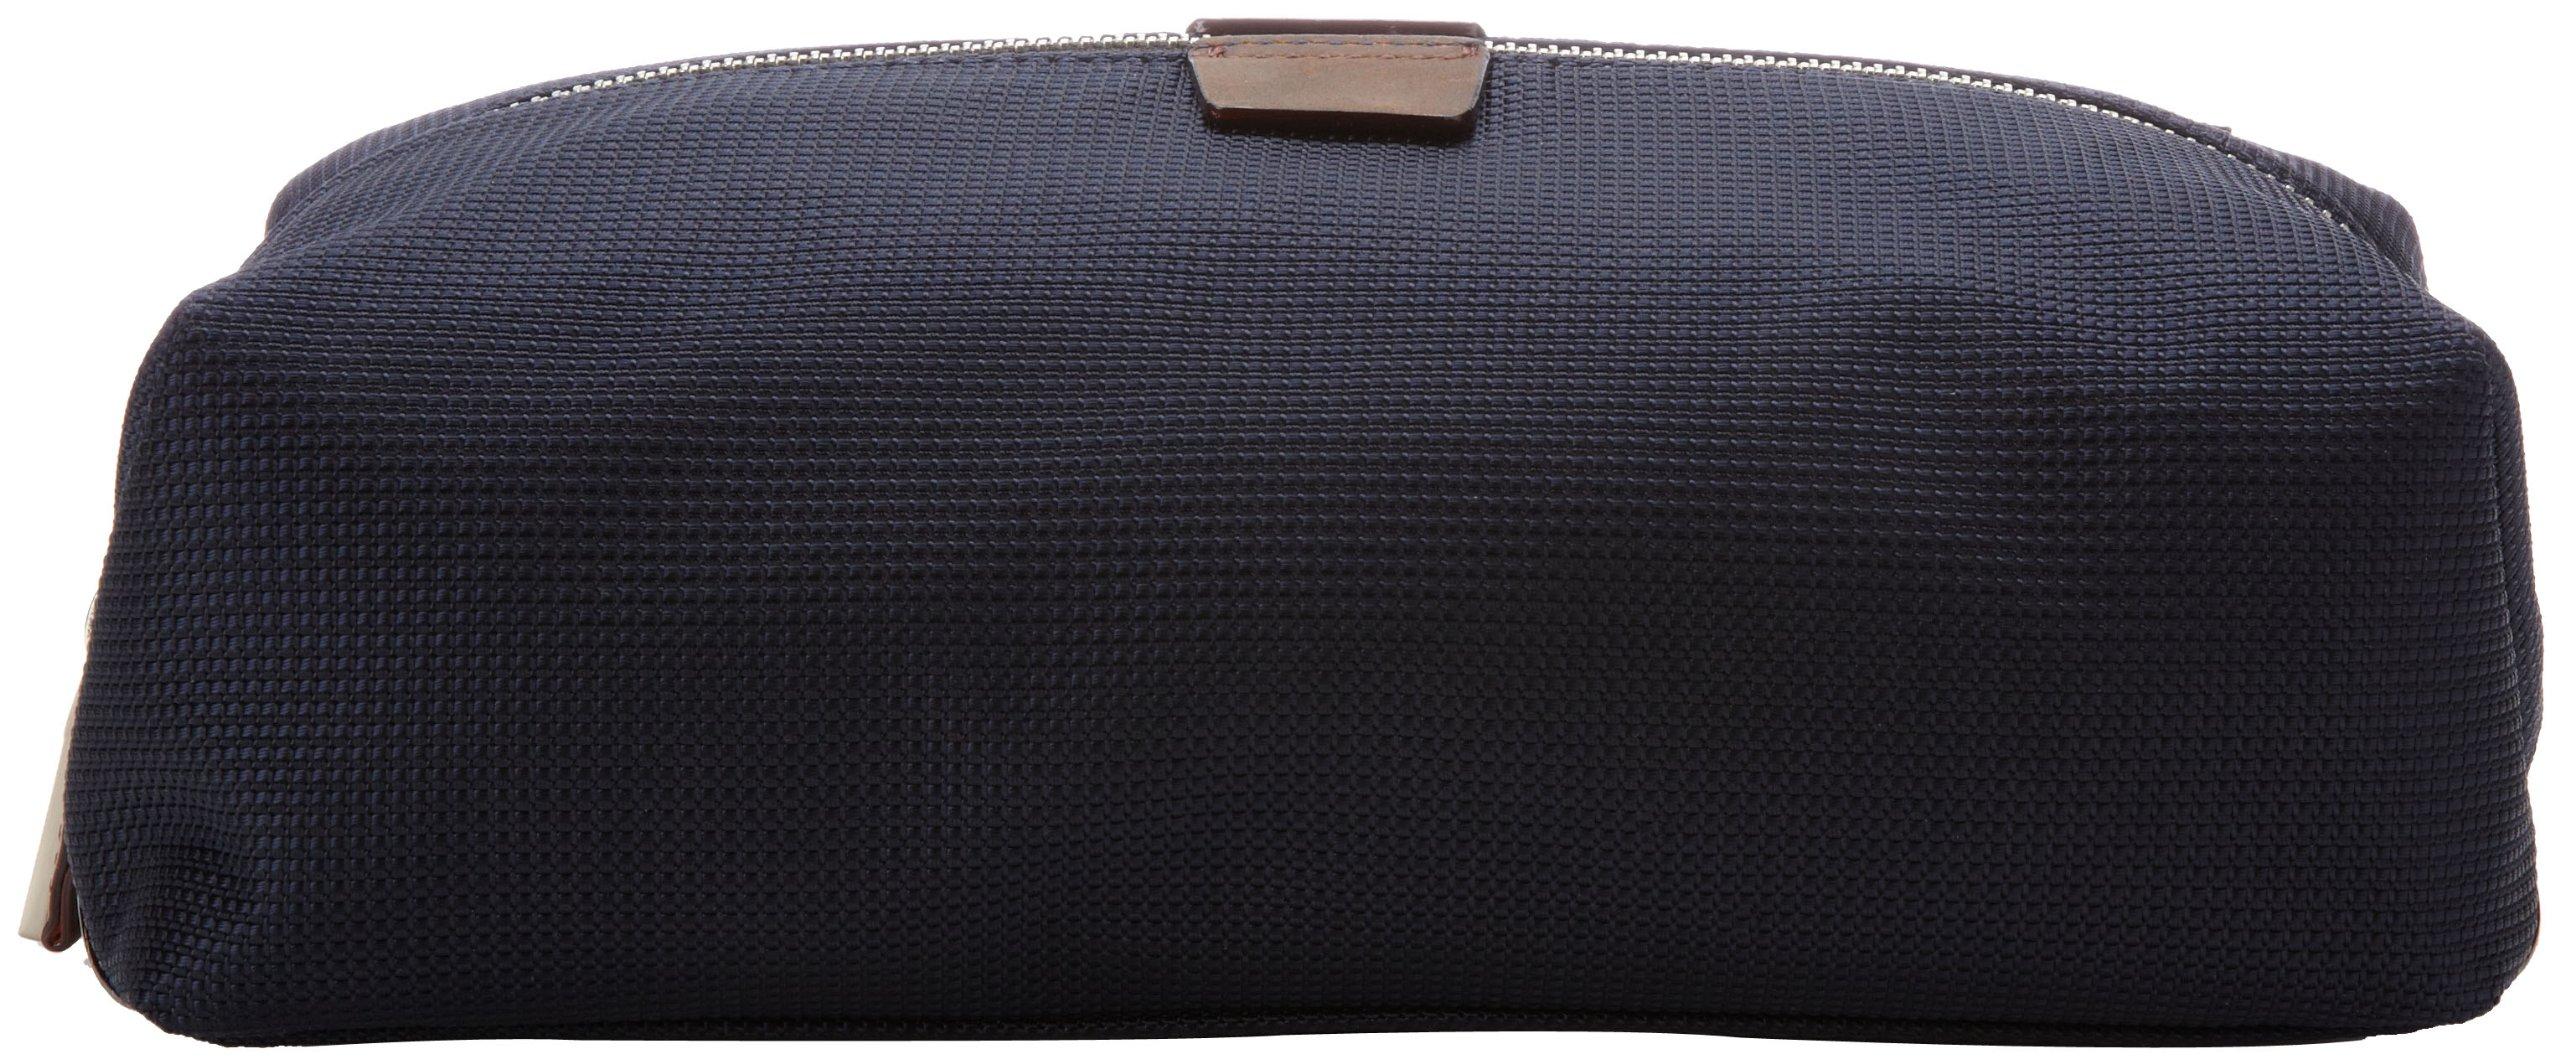 Jack Spade Carryall Case Travel Kit,Navy,One Size